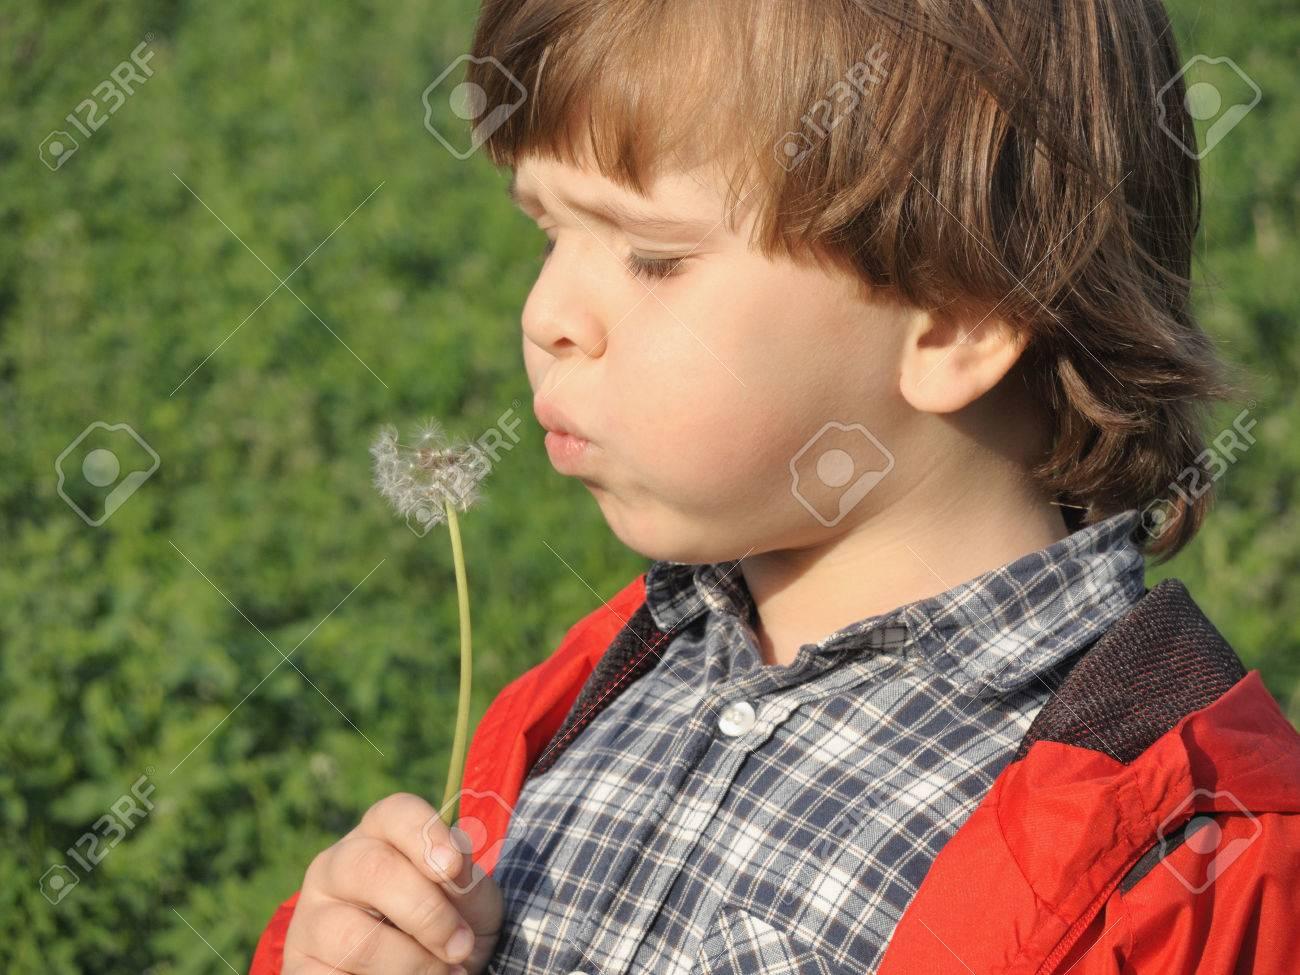 Beautiful little boy blowing dandelion. Happiness, fashionable concept. - 43075951